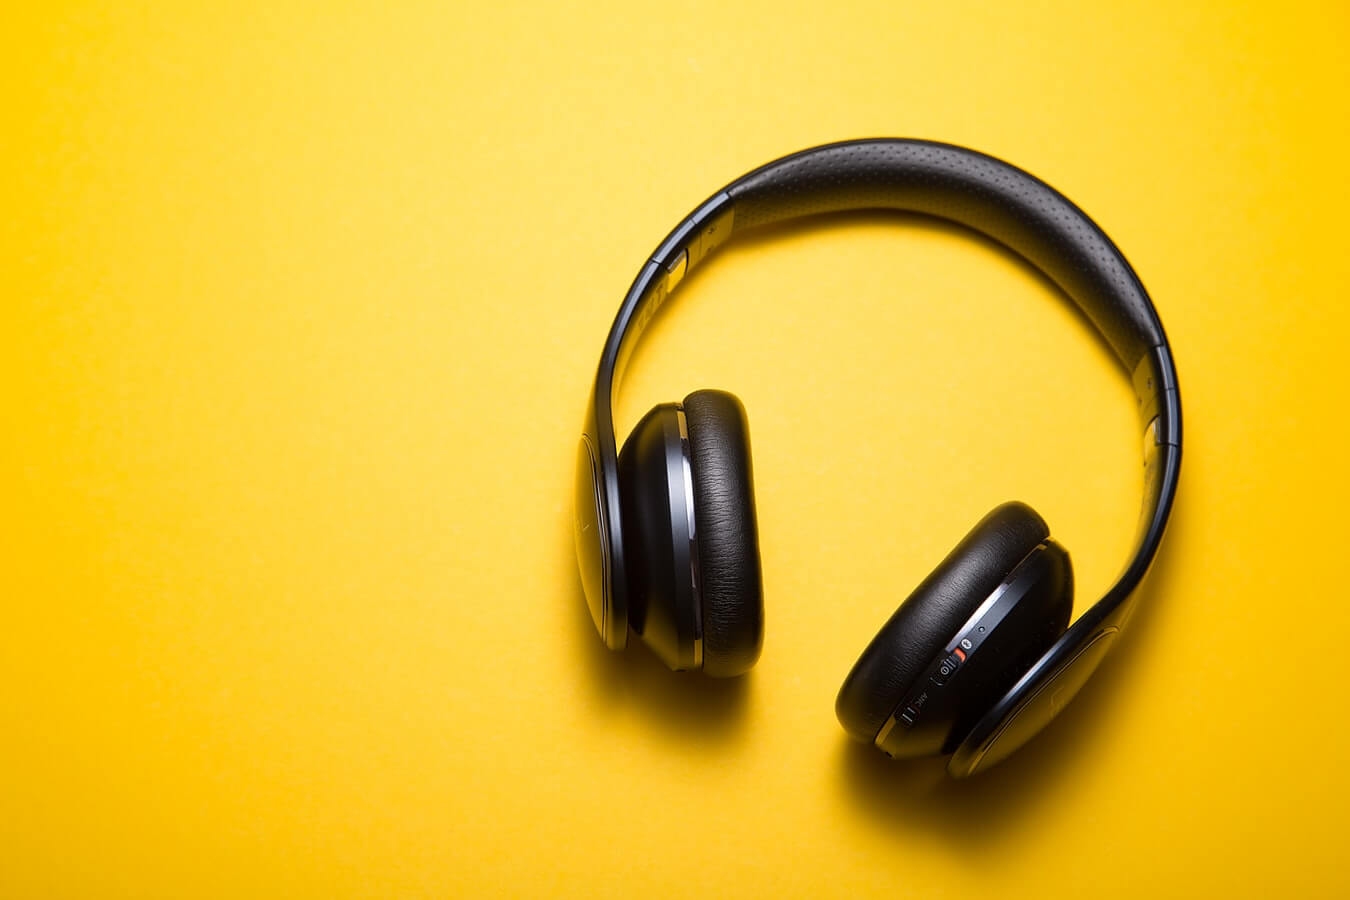 Which is more Comfortable Headphones or Earphones